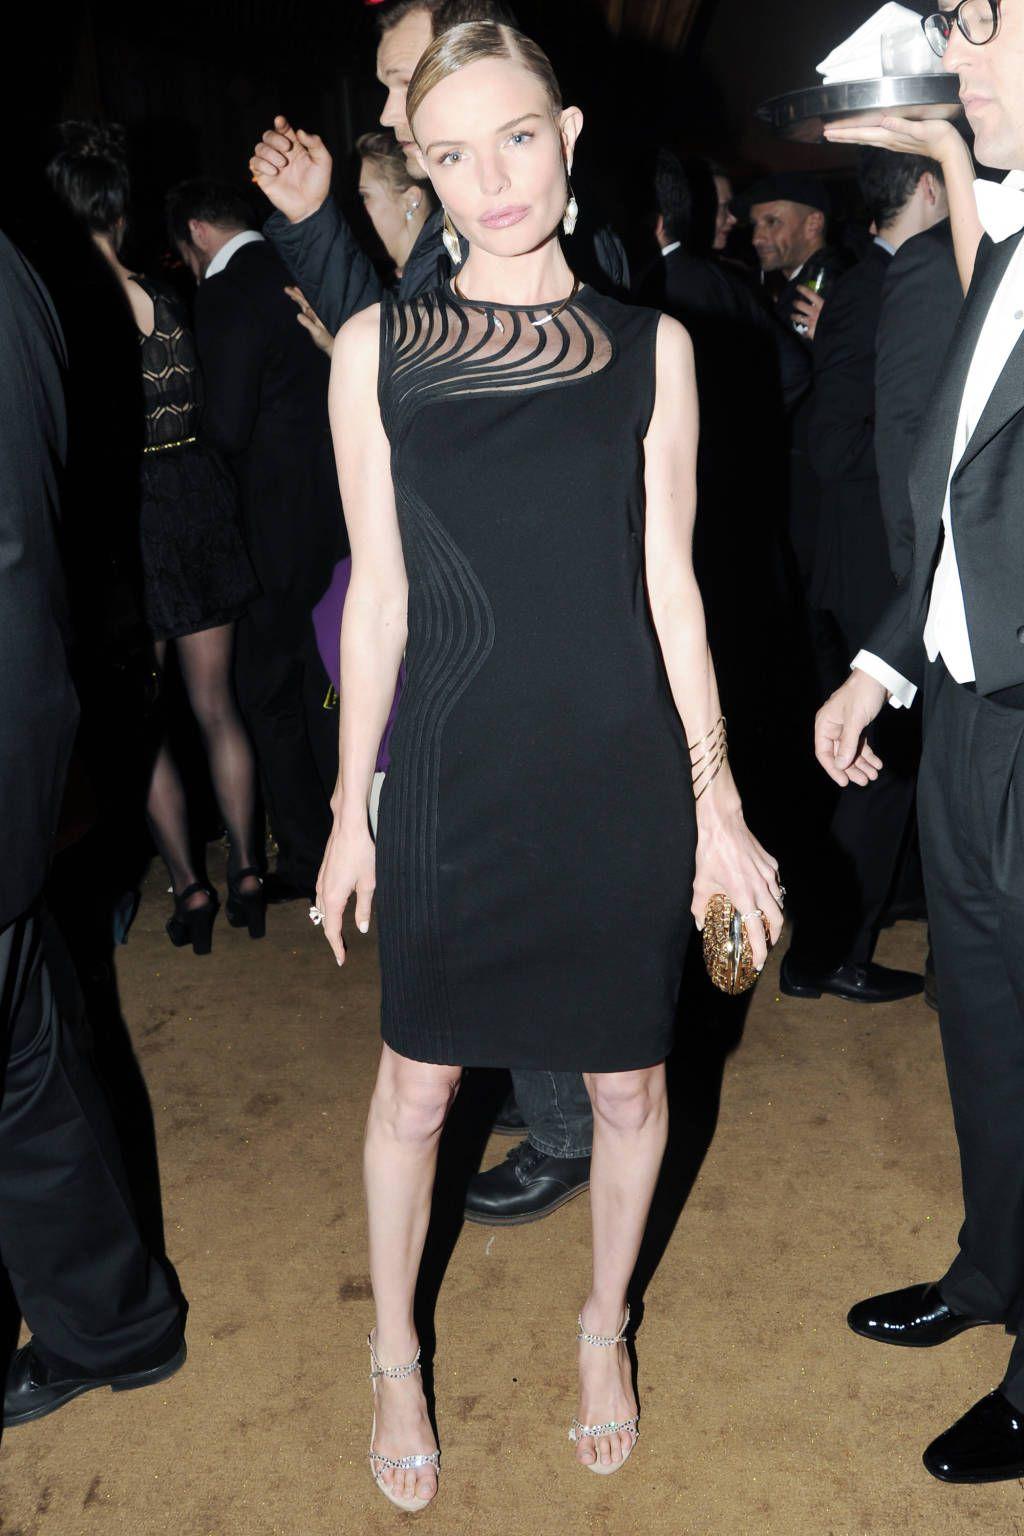 bda58112a155 Little Black Cocktail Dress - Best Little Black Dresses 2013 - Harper s  BAZAAR New Year s Eve